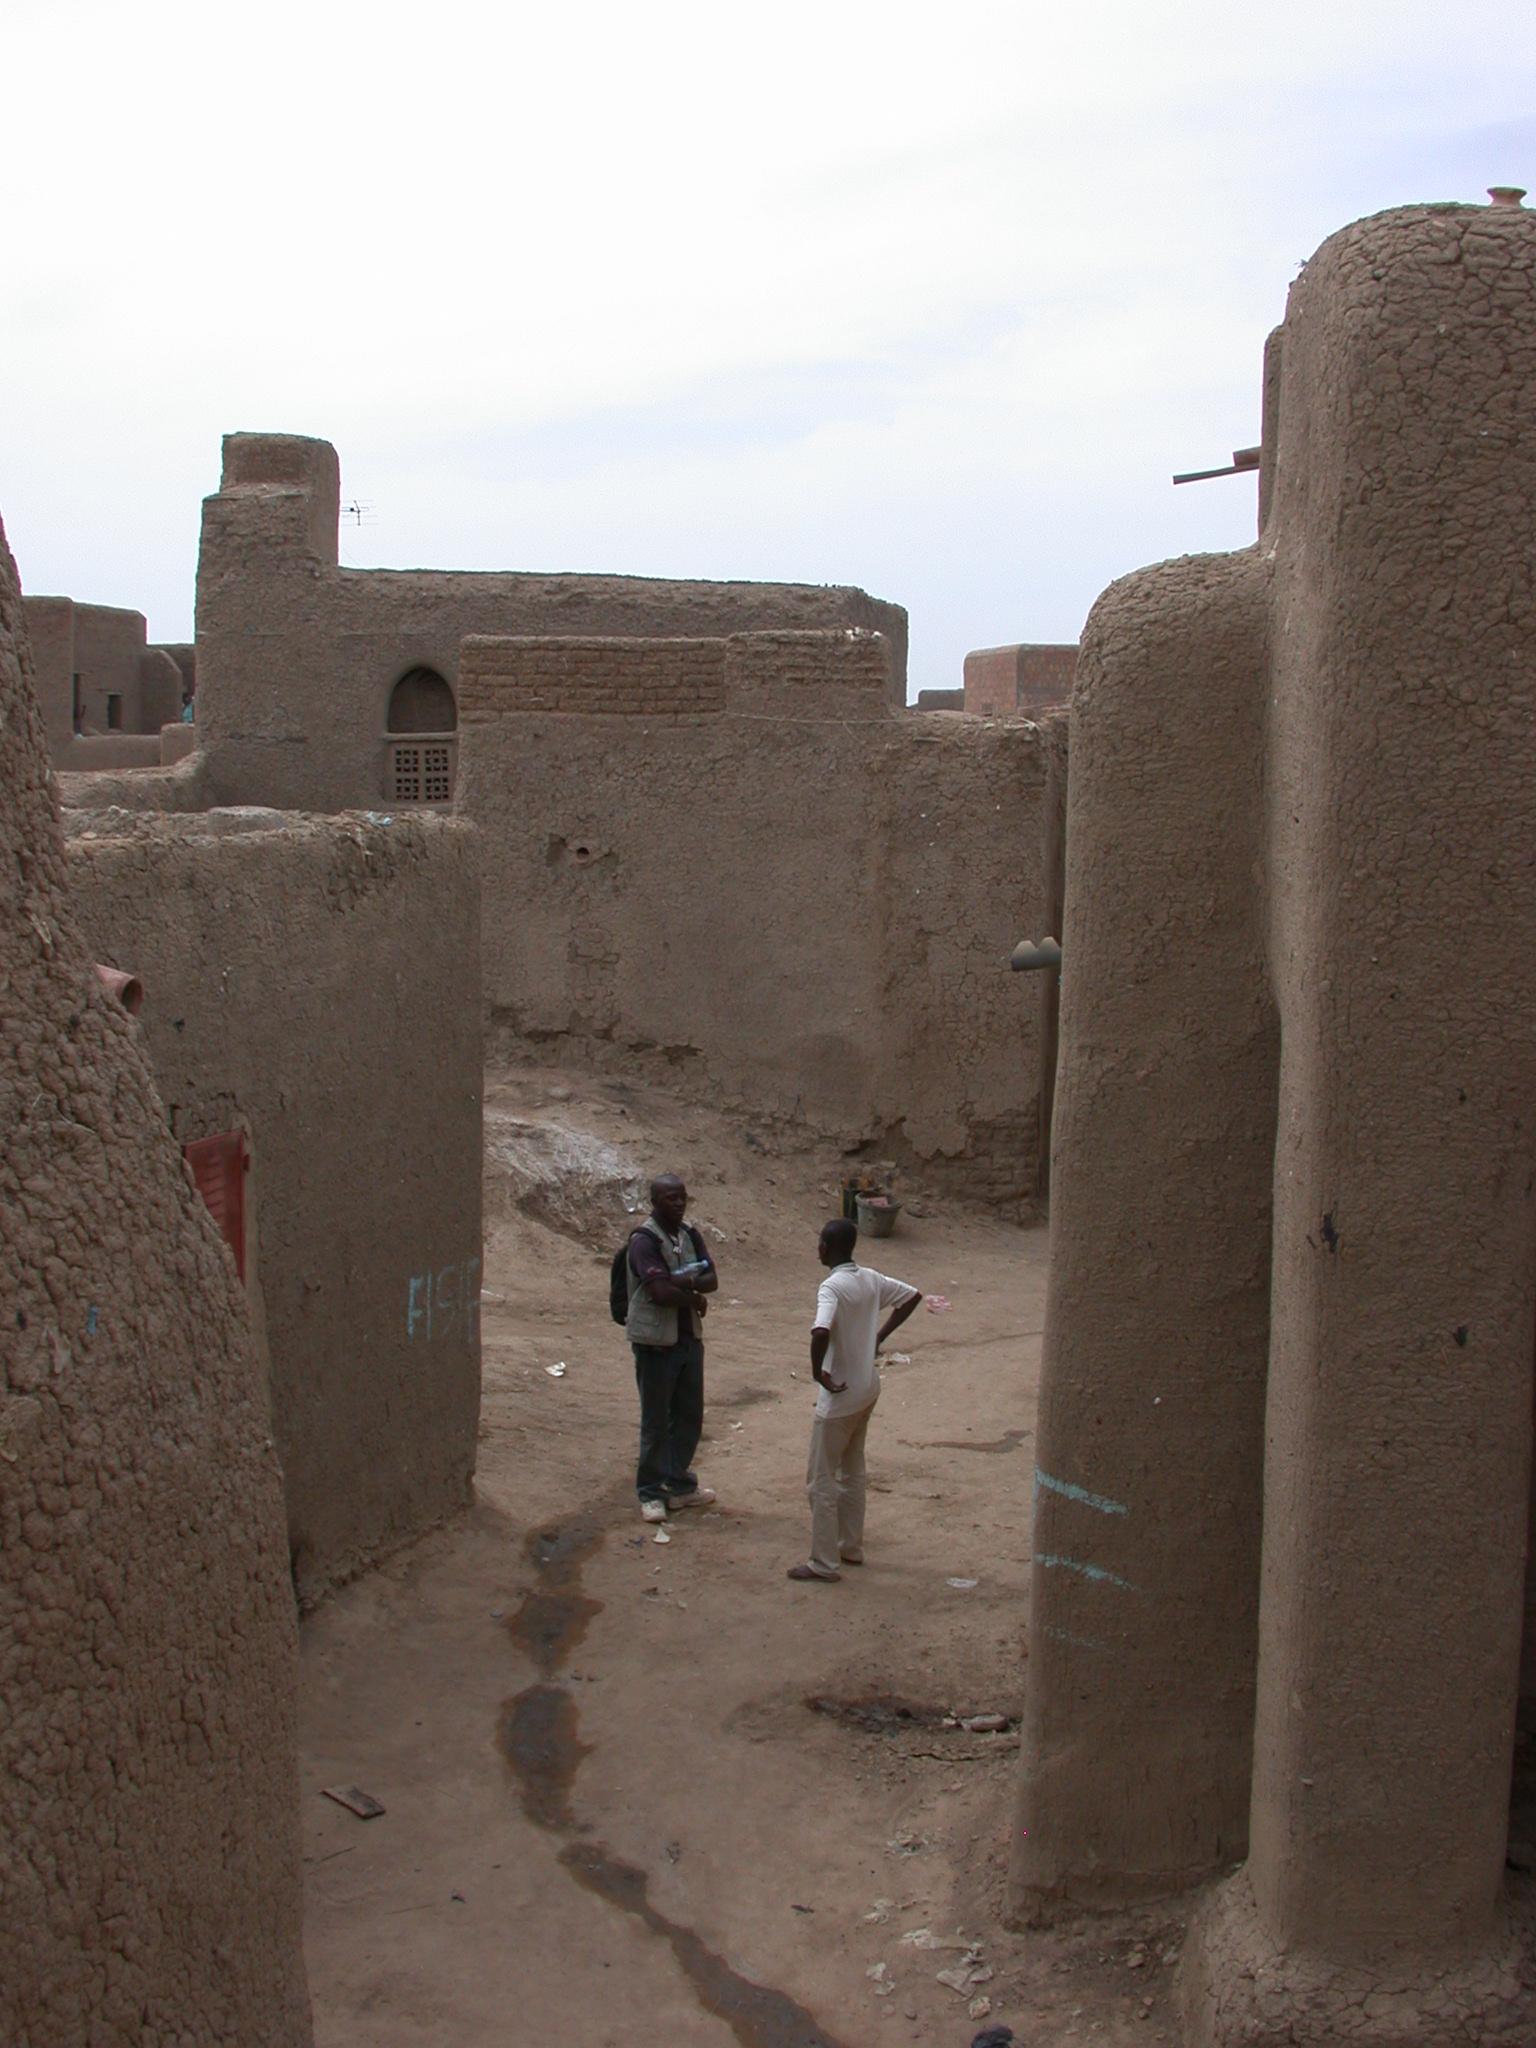 Streets of Jenne, Mali